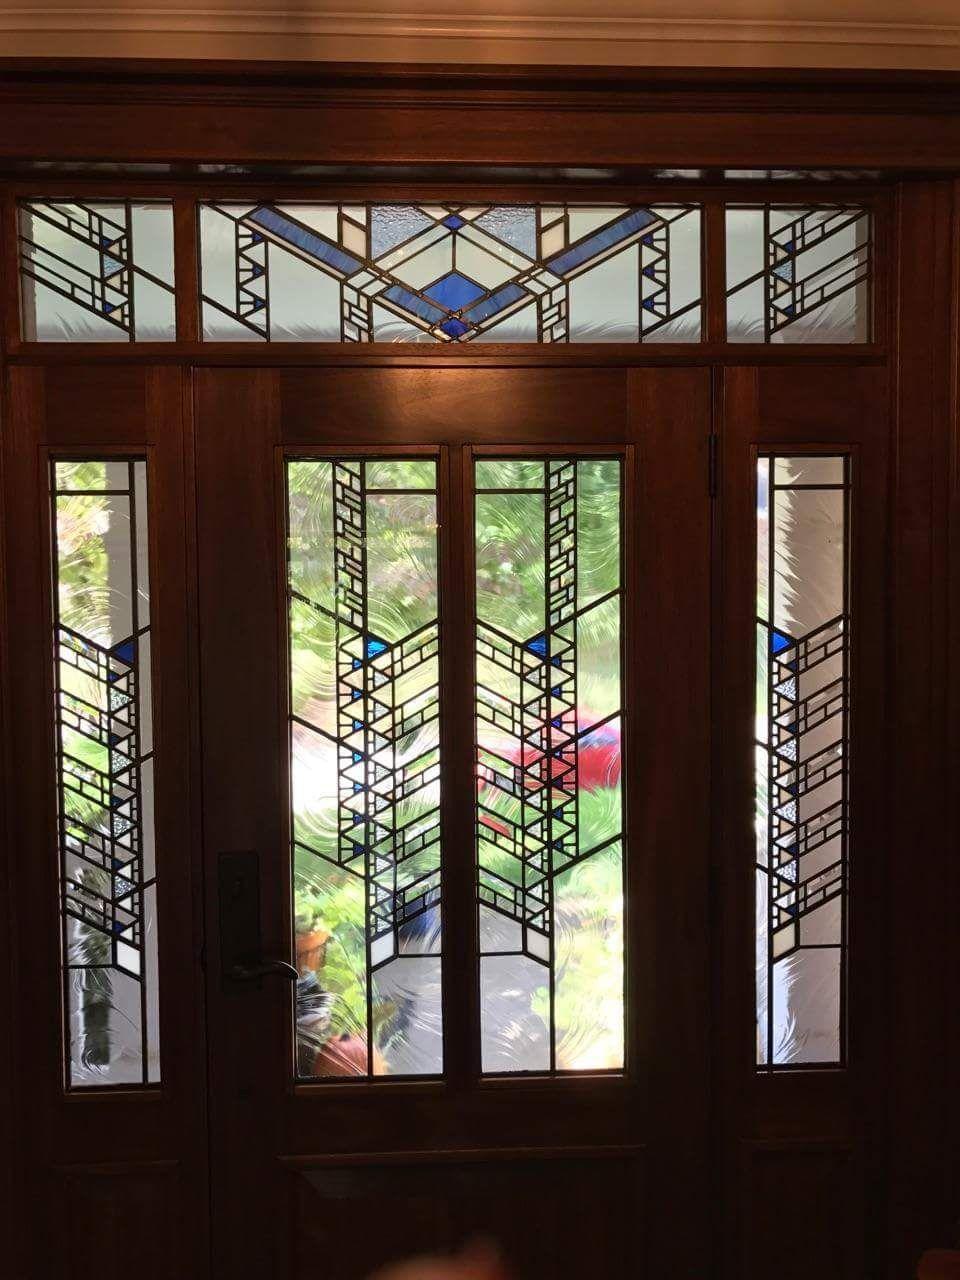 Image Result For Frank Lloyd Glass Transom Frank Lloyd Wright Stained Glass Stained Glass Door Stained Glass